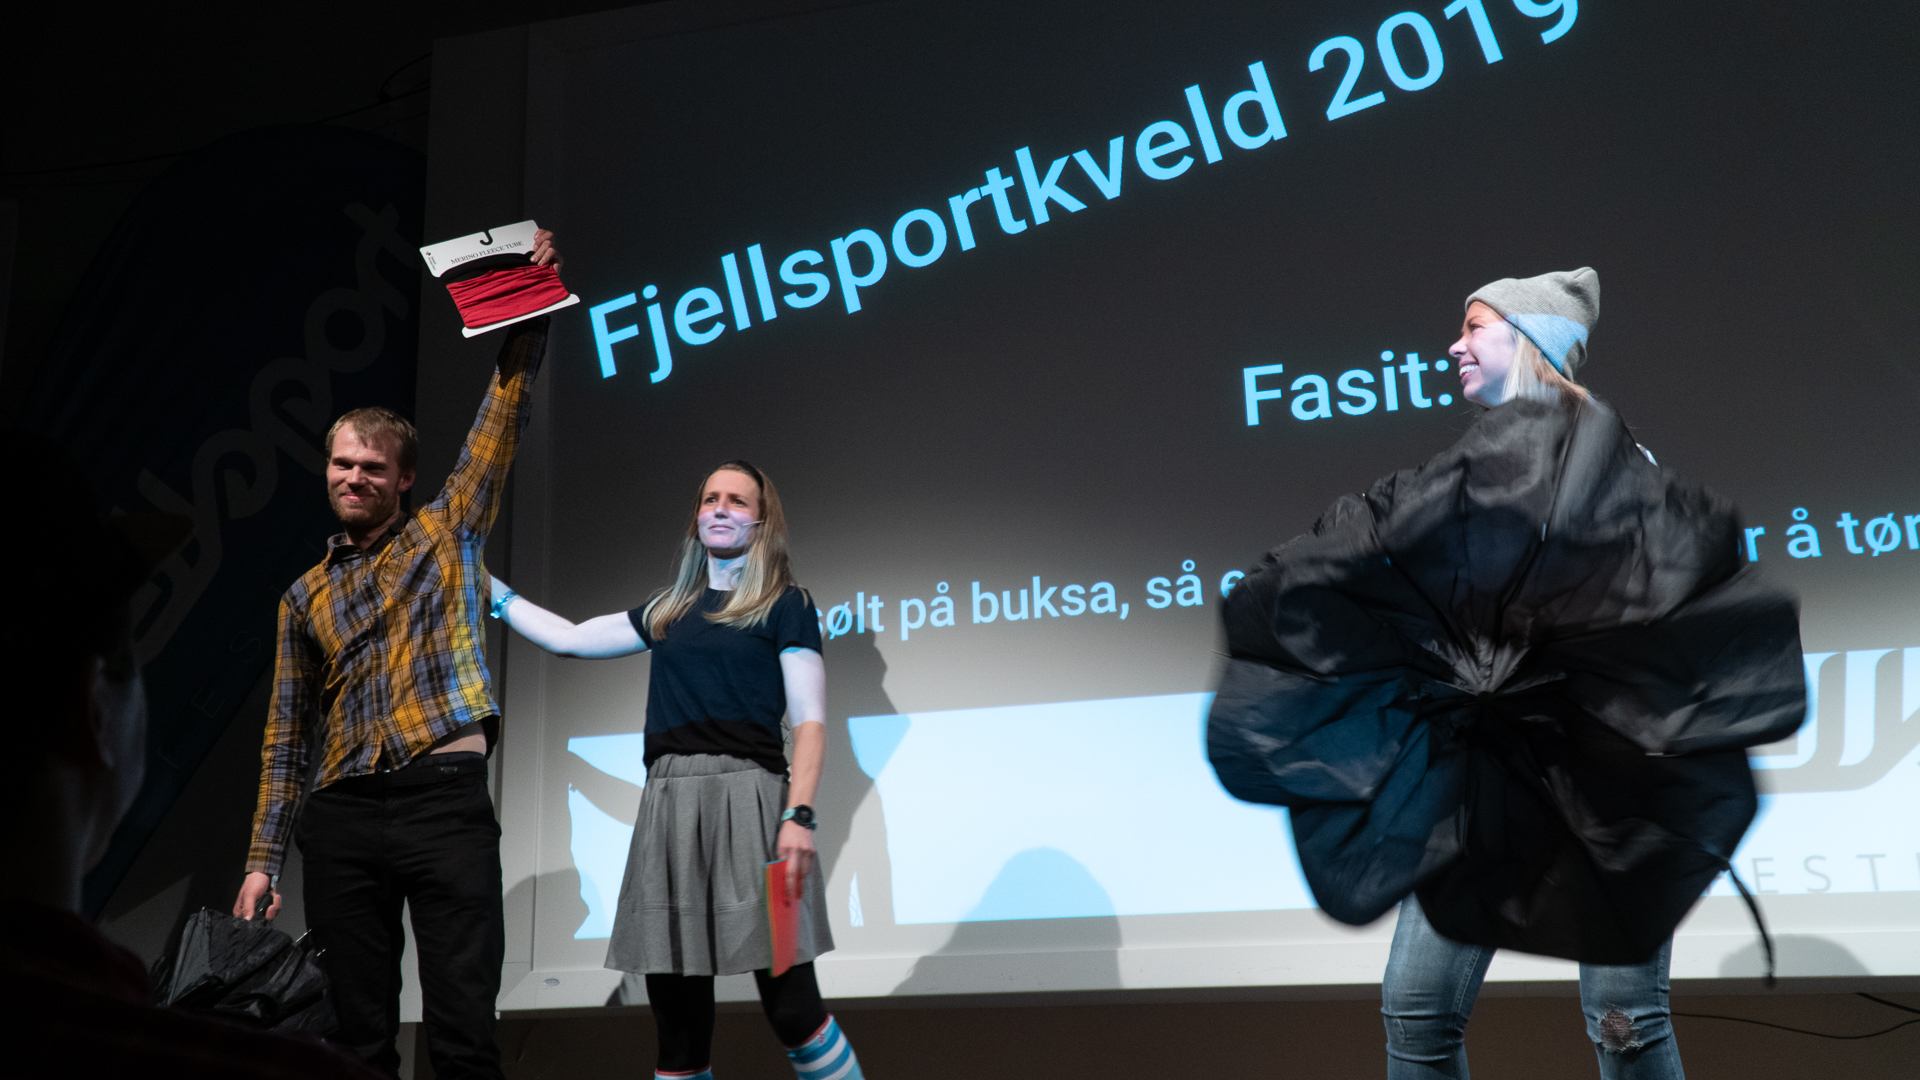 Torgeir Sørmo Holmslet - Fjellsportkveld (lørdag)-1.jpg